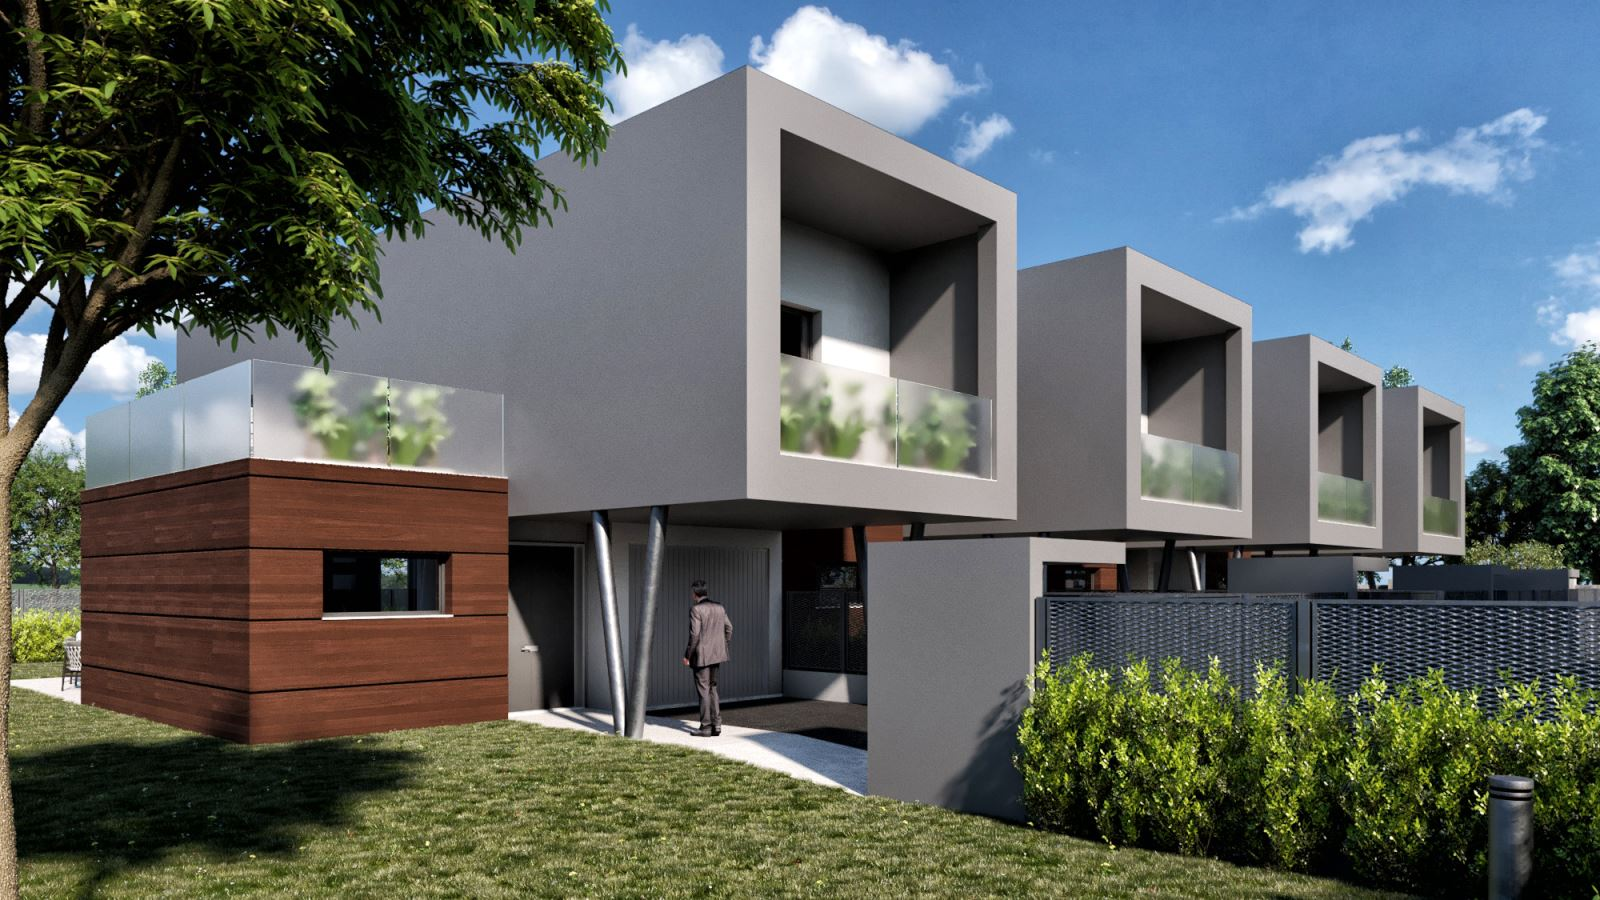 Giardini Per Case Moderne vendita appartamenti - case - garbagnate milanese